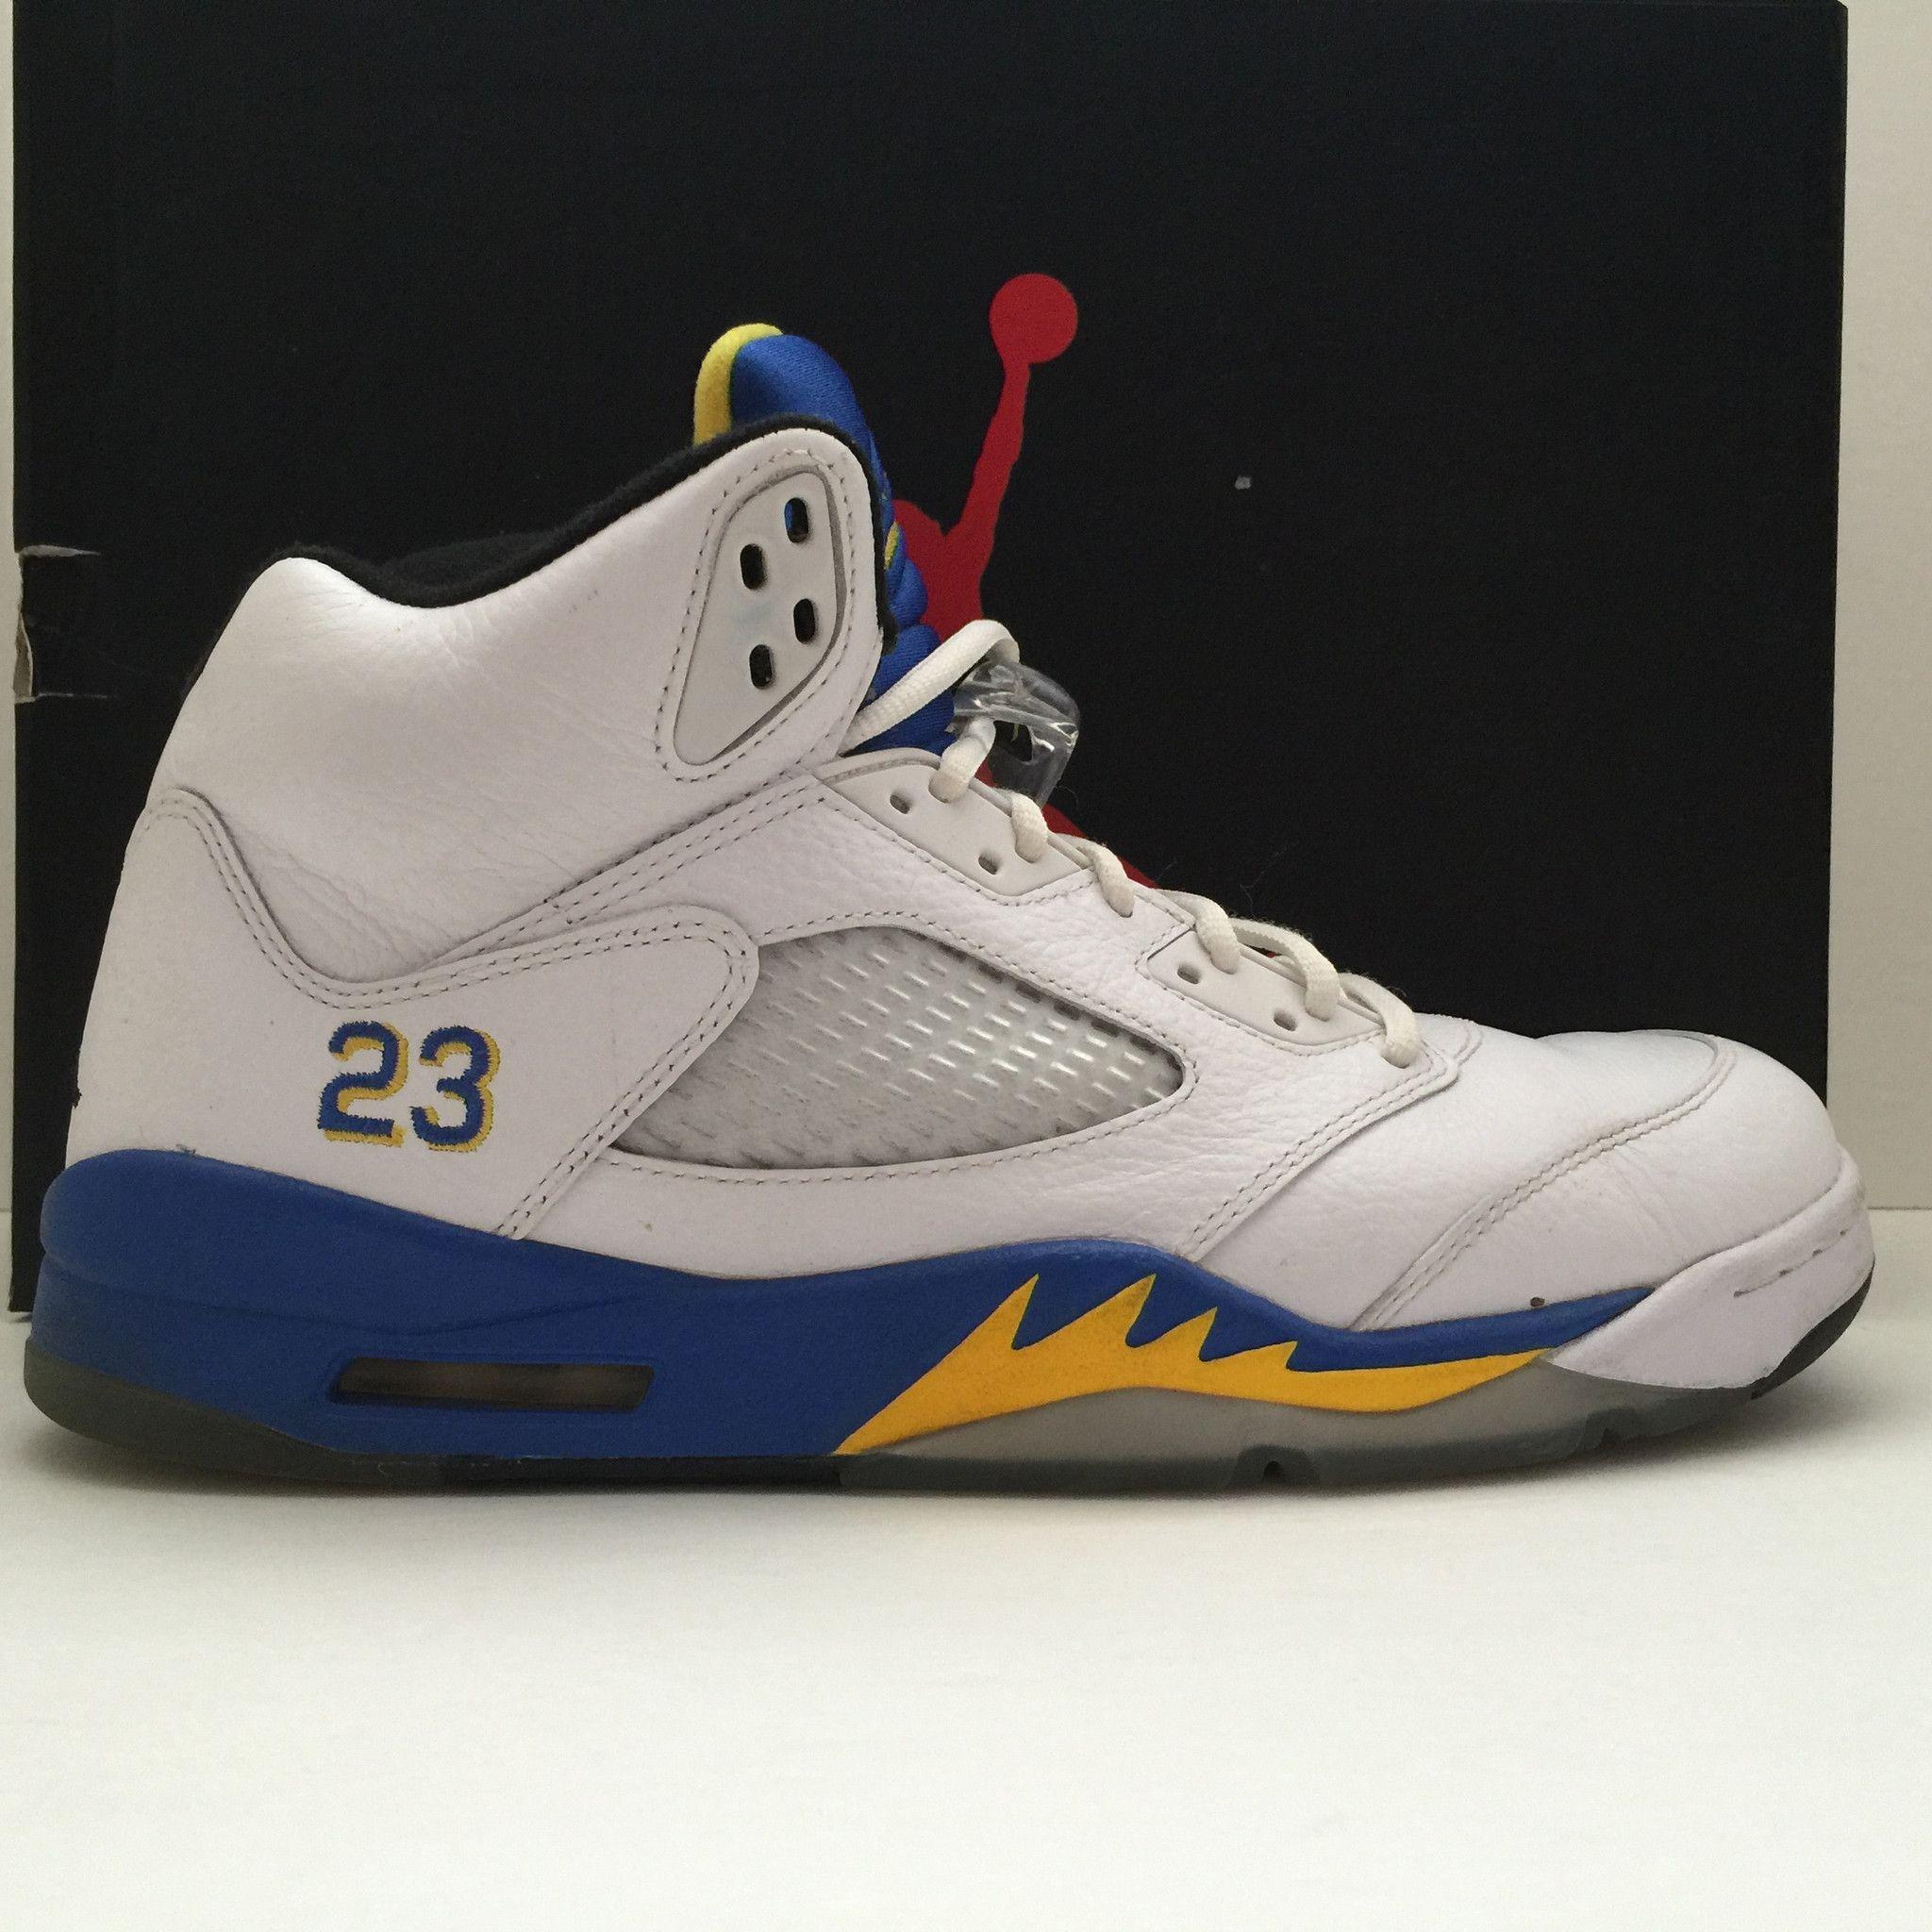 Nike Air Jordan Shoes Size US 11.5